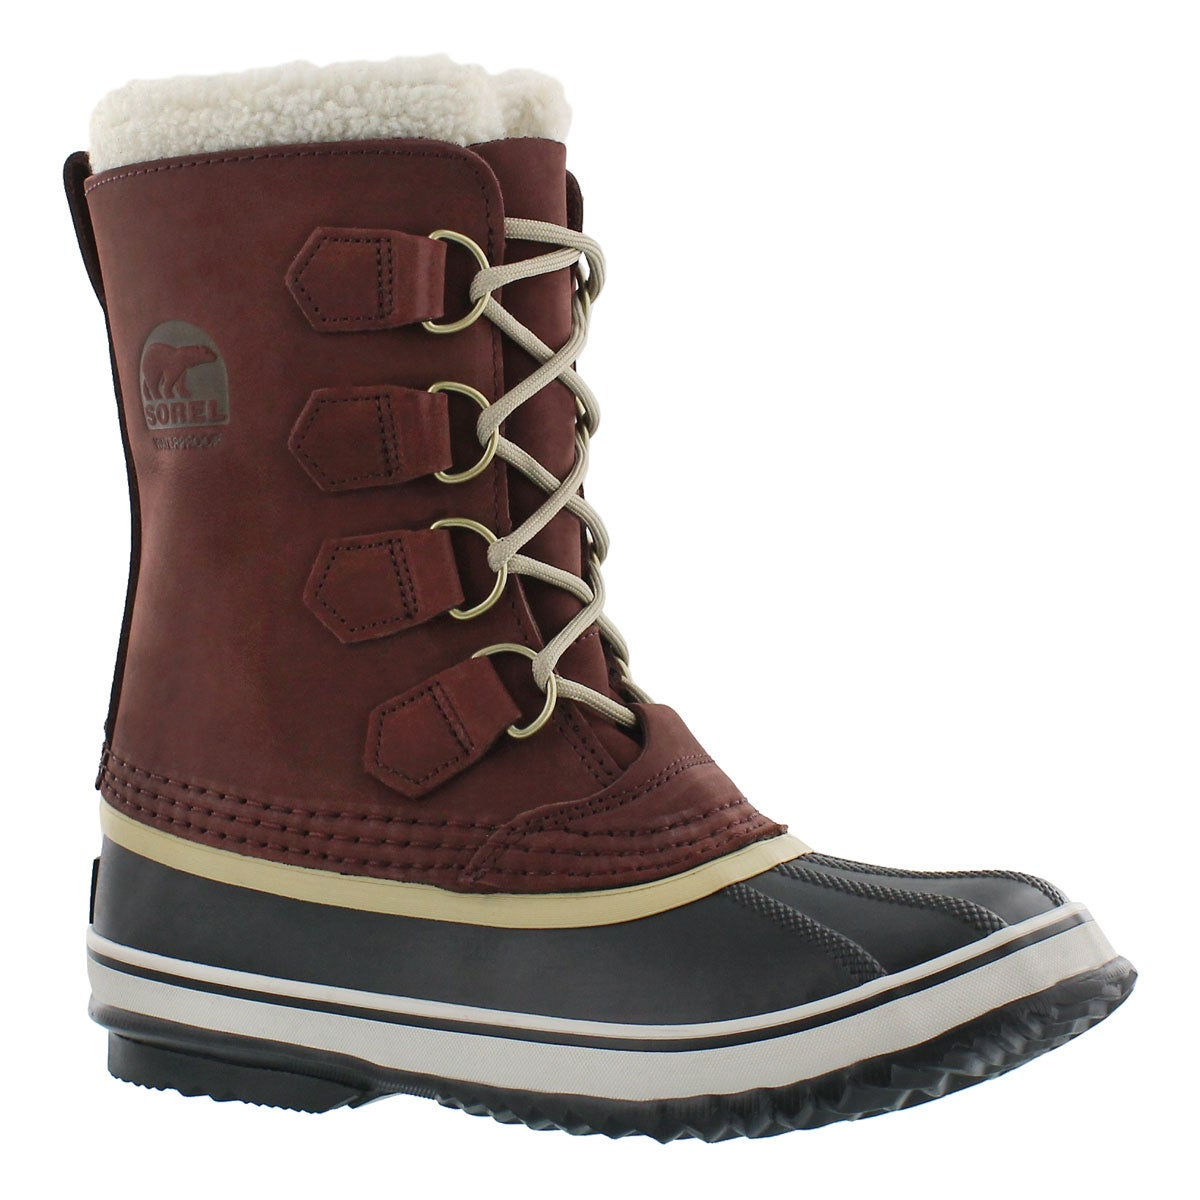 Women's 1964 PAC 2 redwood winter boots